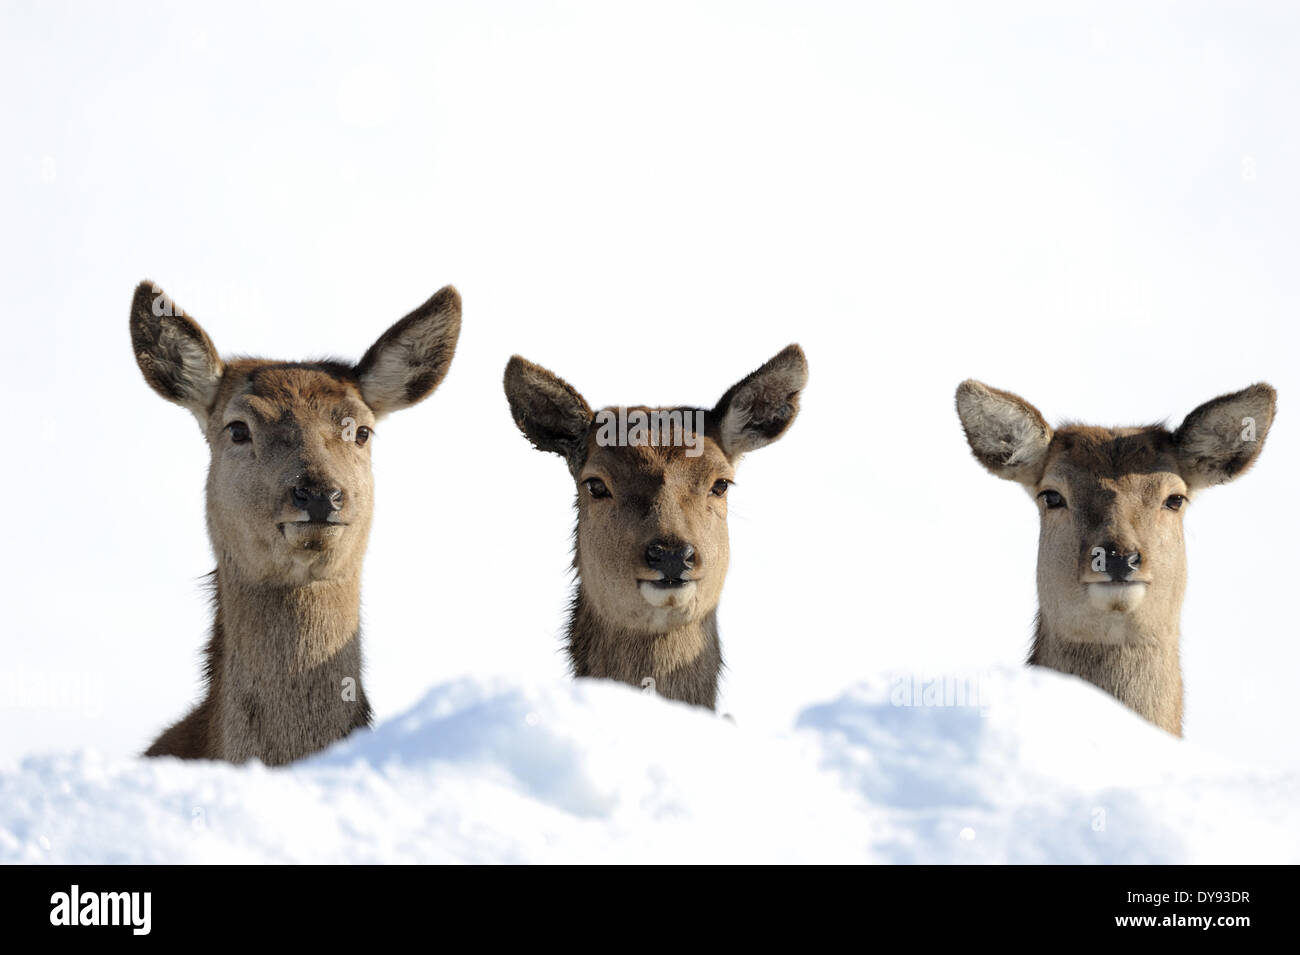 Red deer antlers antler Cervid Cervus elaphus deer stag stags hoofed animals summers velvet autumn snow animal animals - Stock Image